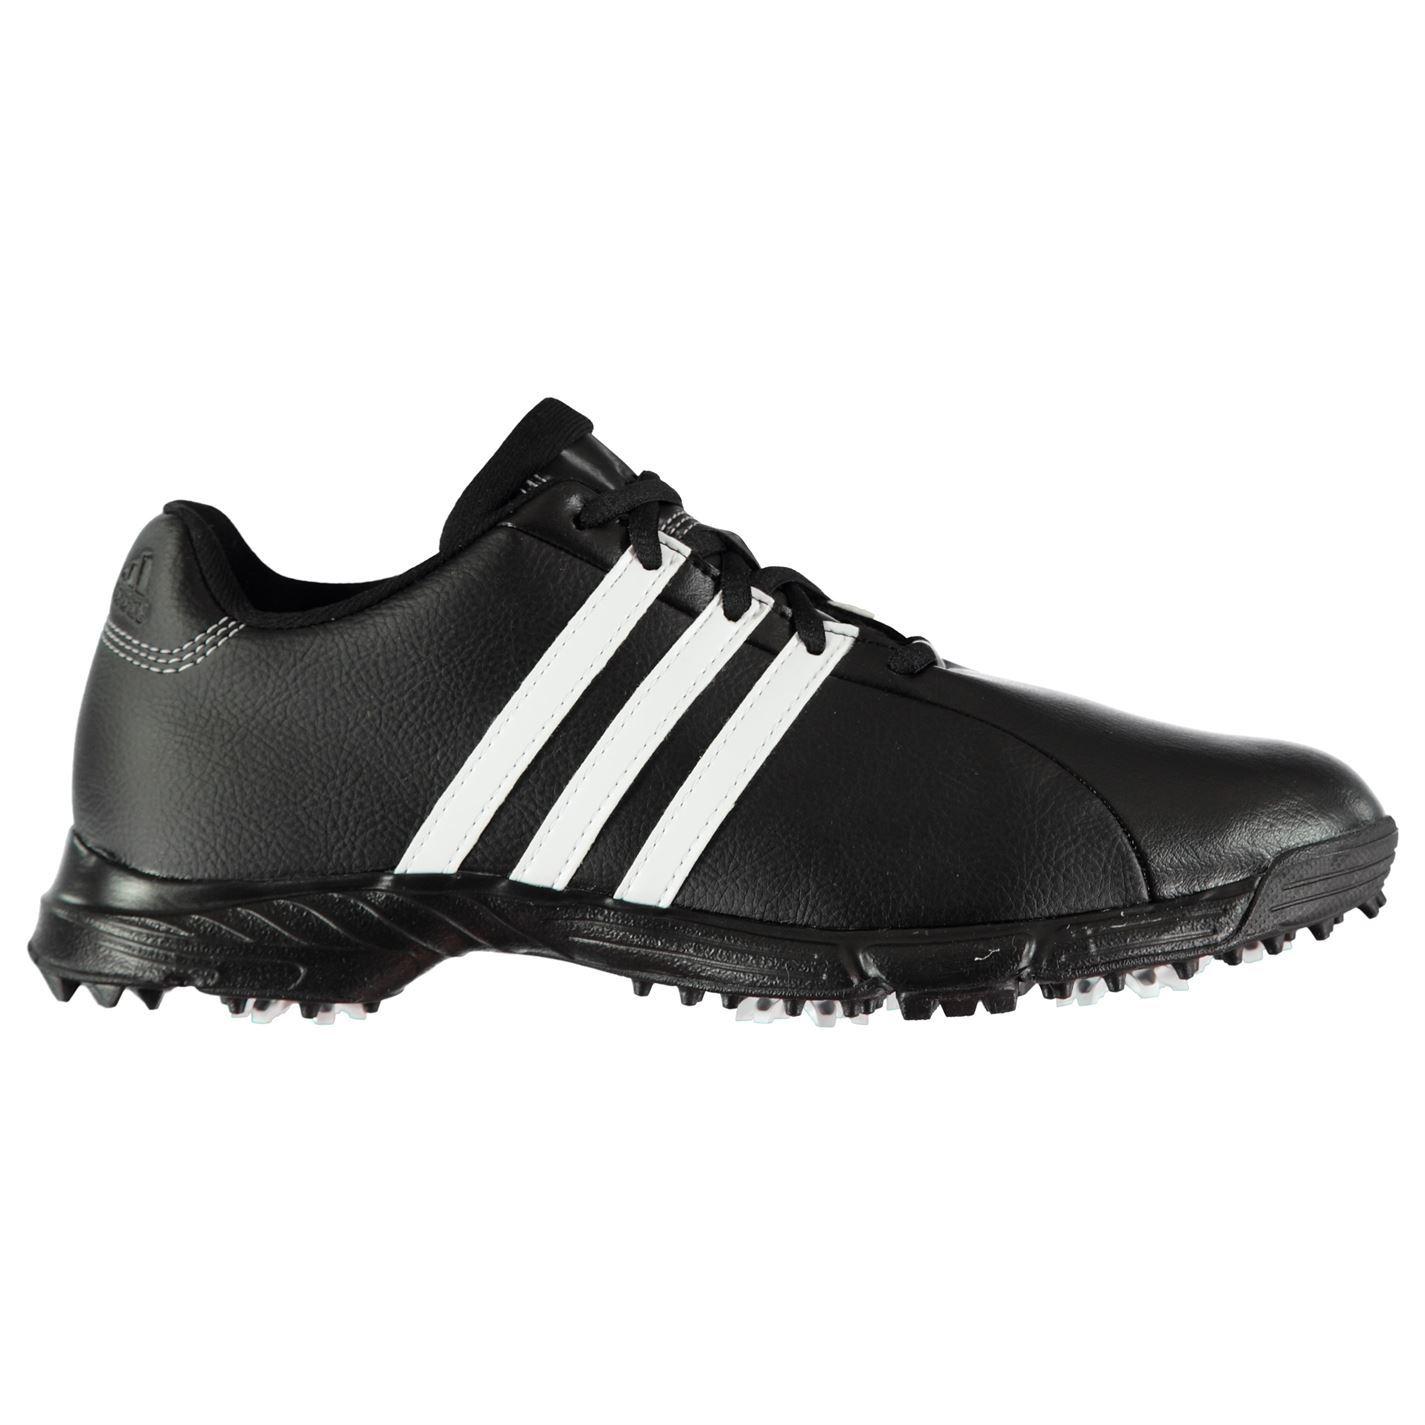 adidas-Golflite-Golf-Shoes-Mens-Spikes-Footwear thumbnail 4